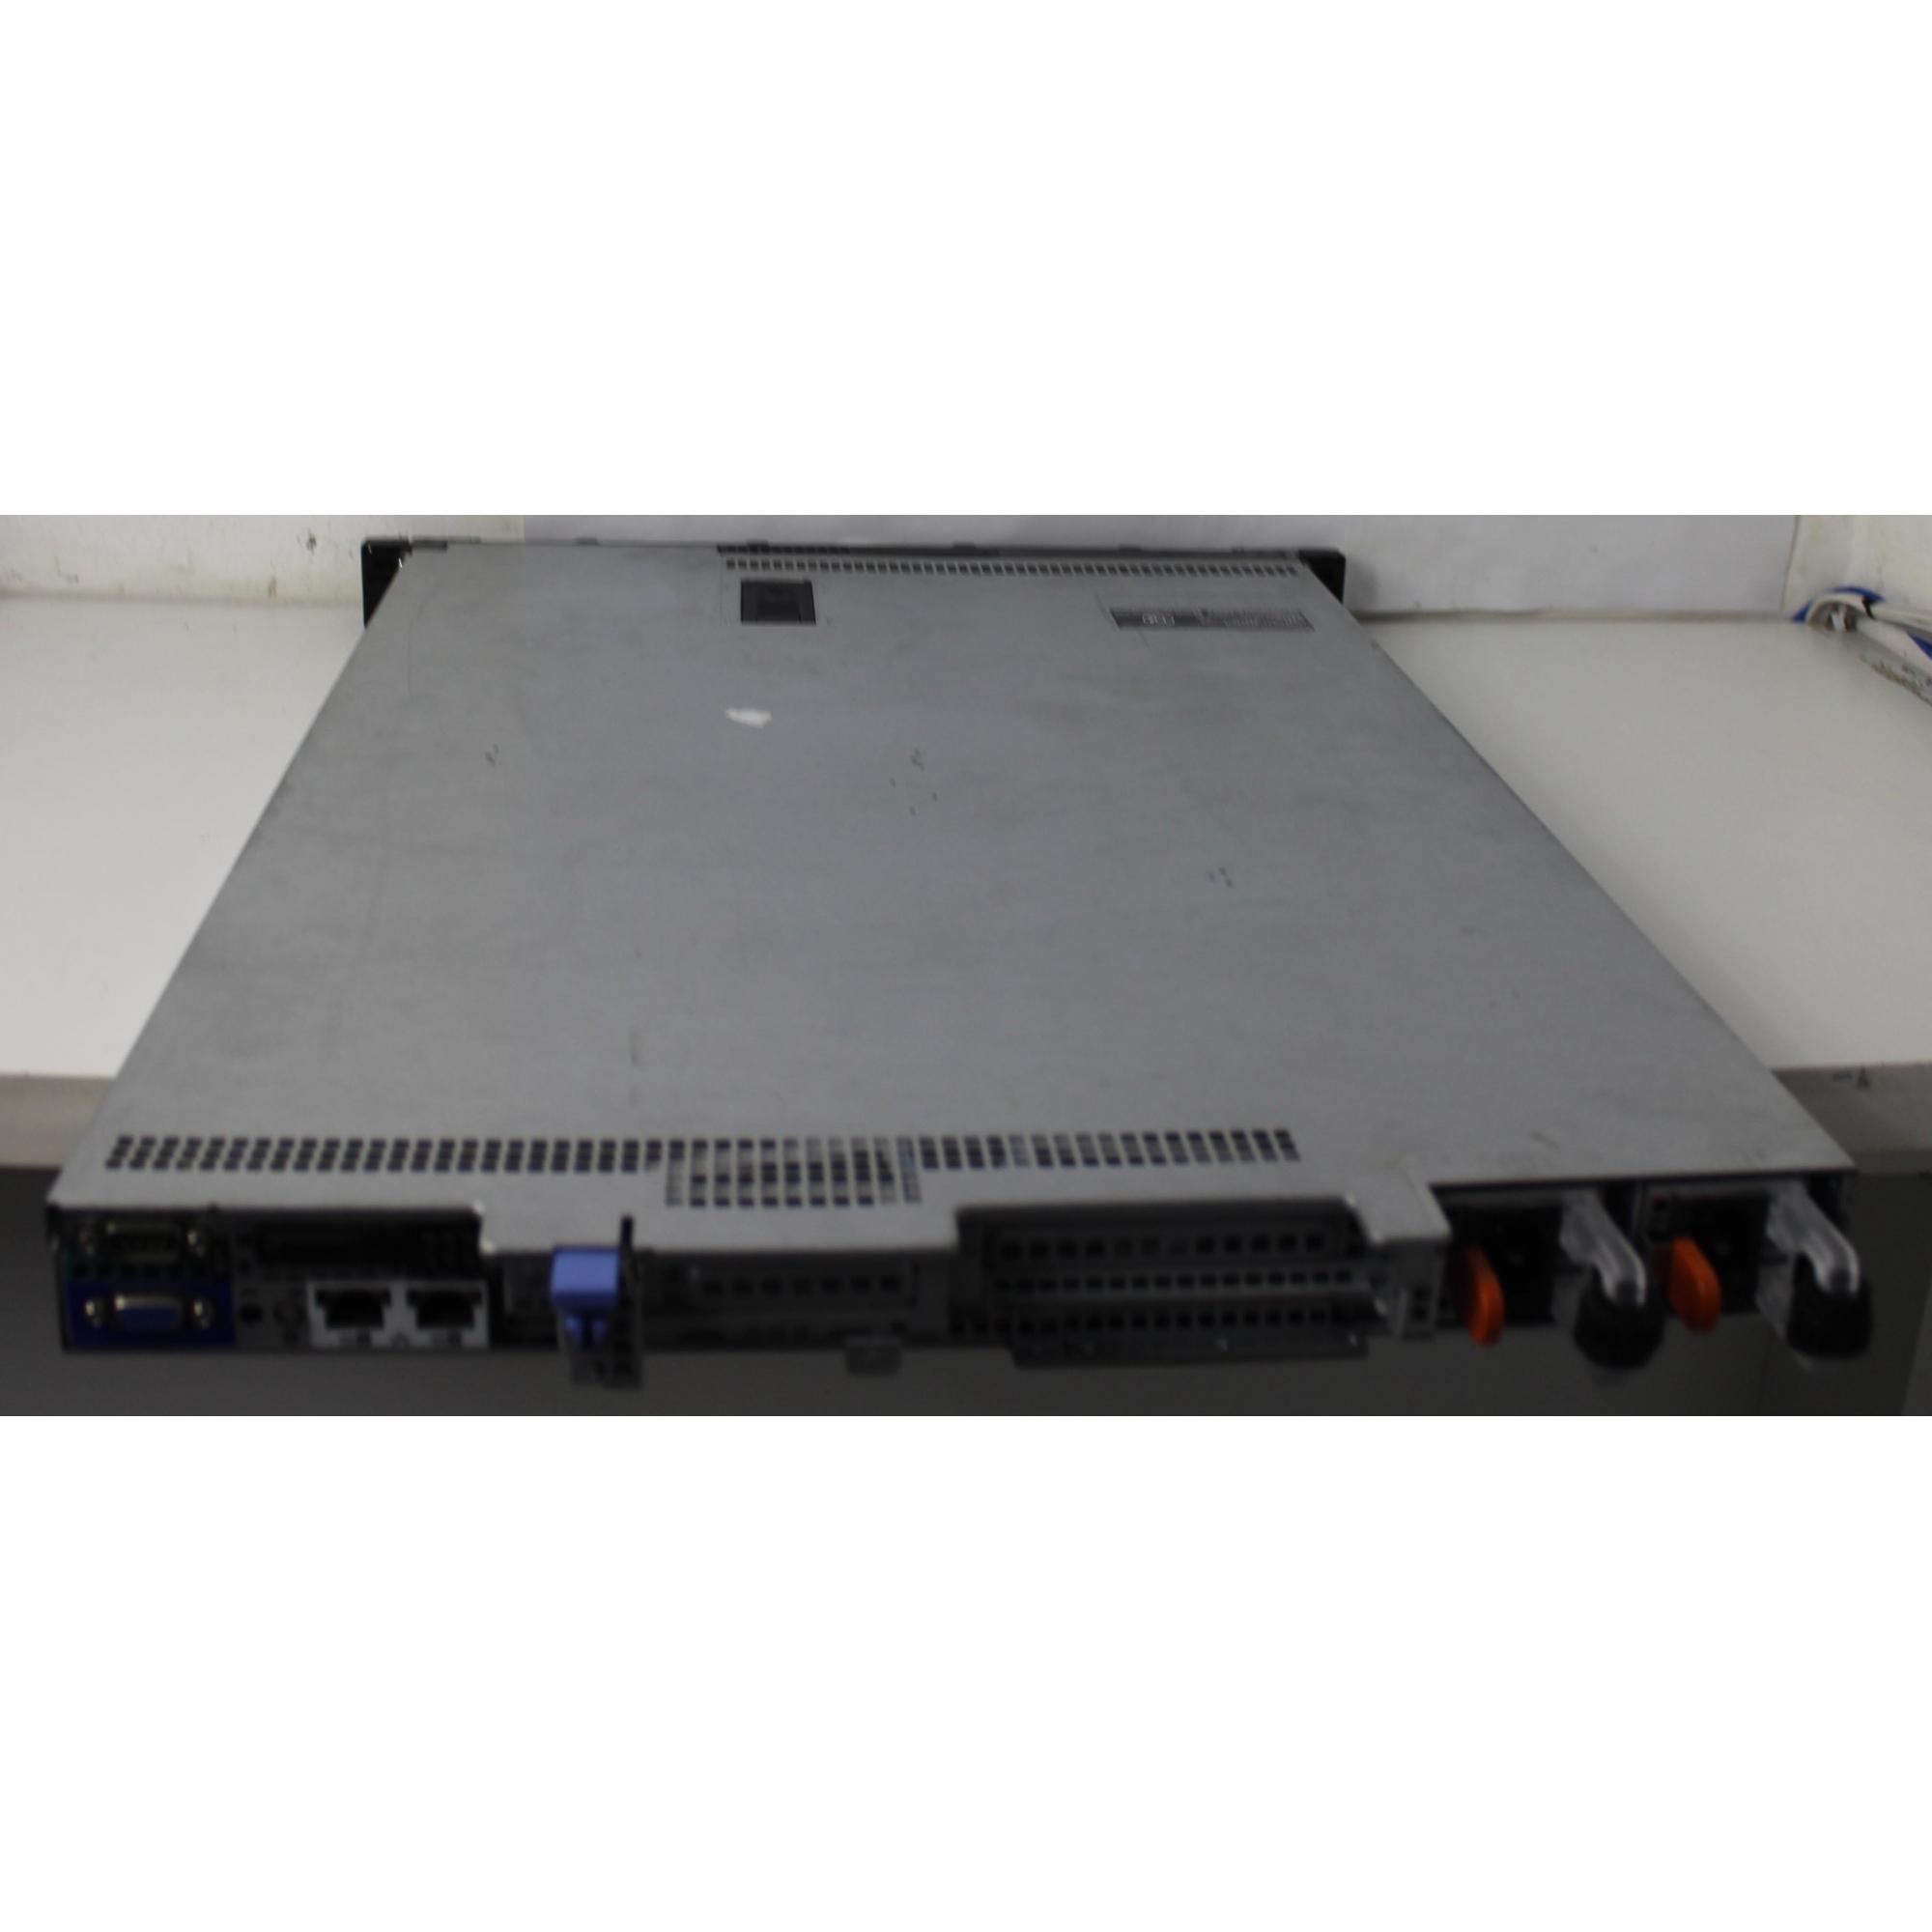 Servidor Dell Poweredge R330 Intel Xeon 3GHz 16GB HD-1TB (Não Enviamos)